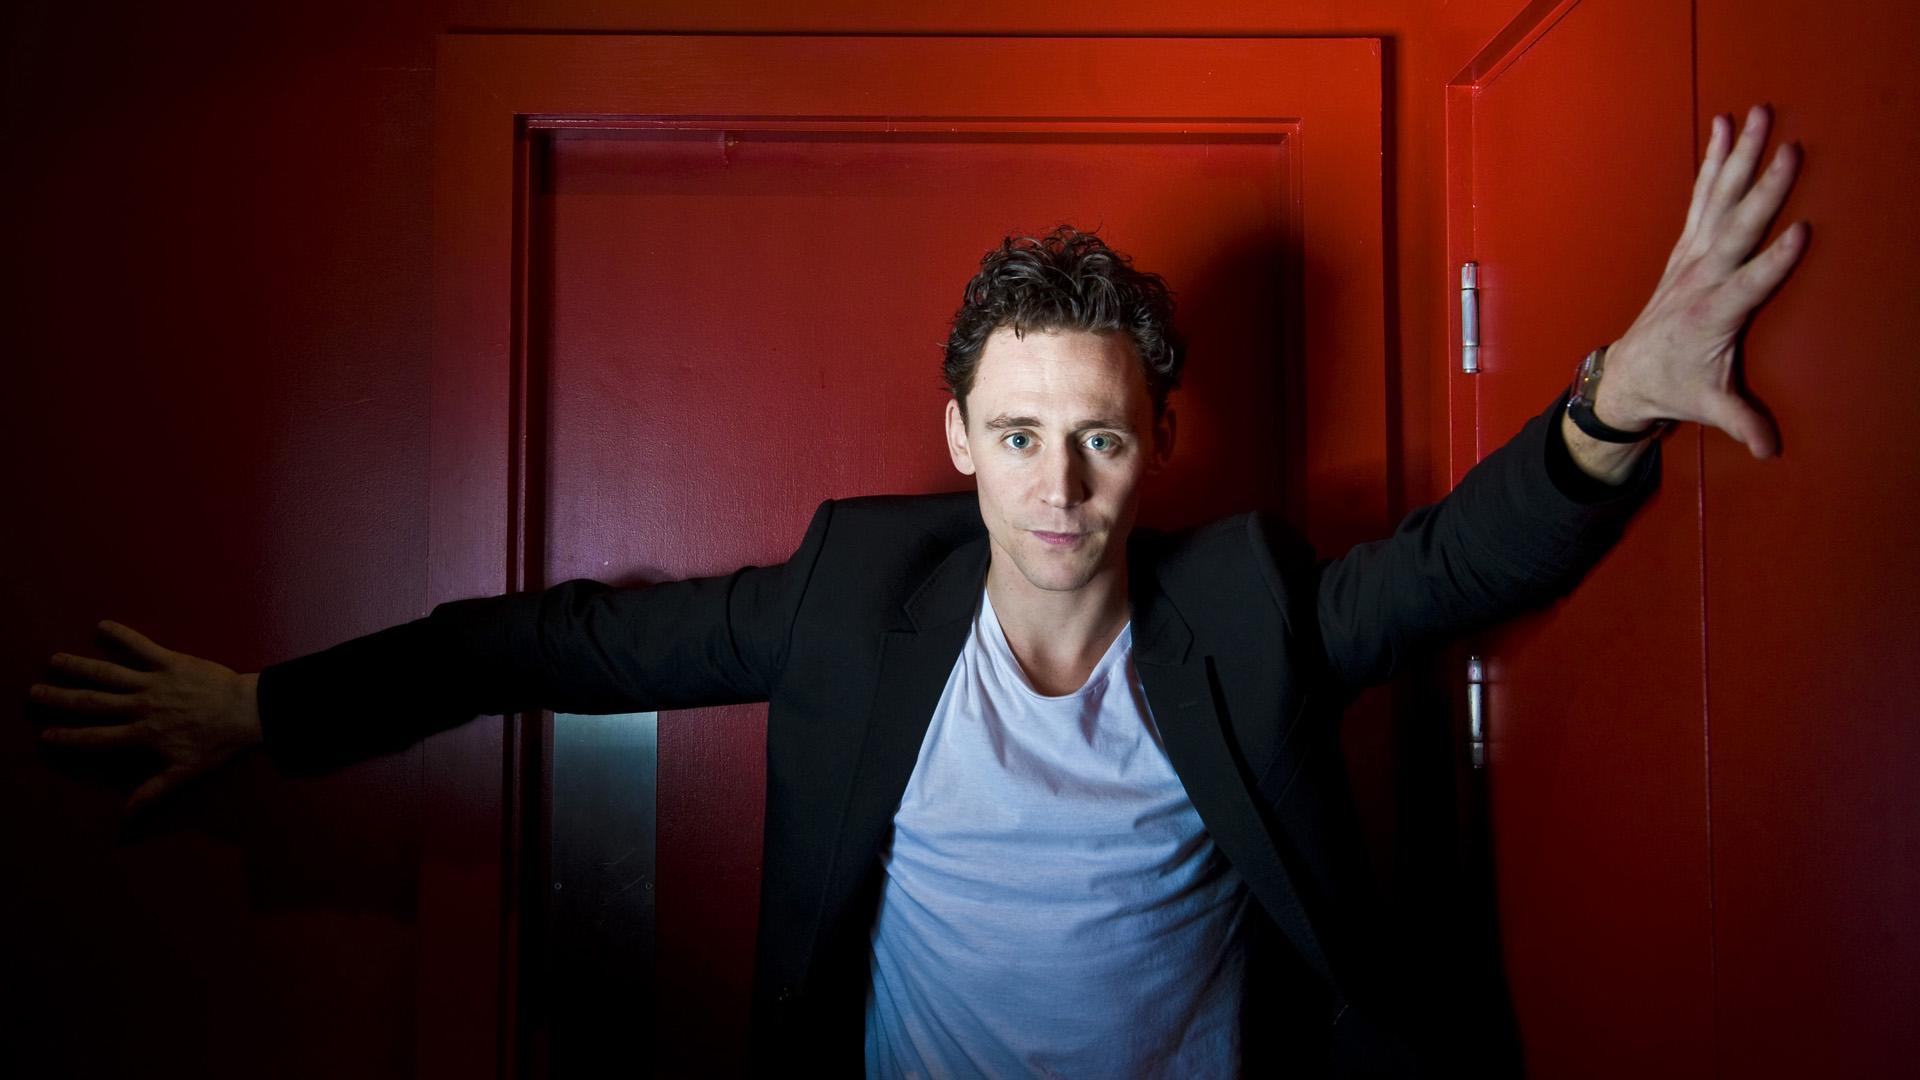 Tom Hiddleston 1920x1080